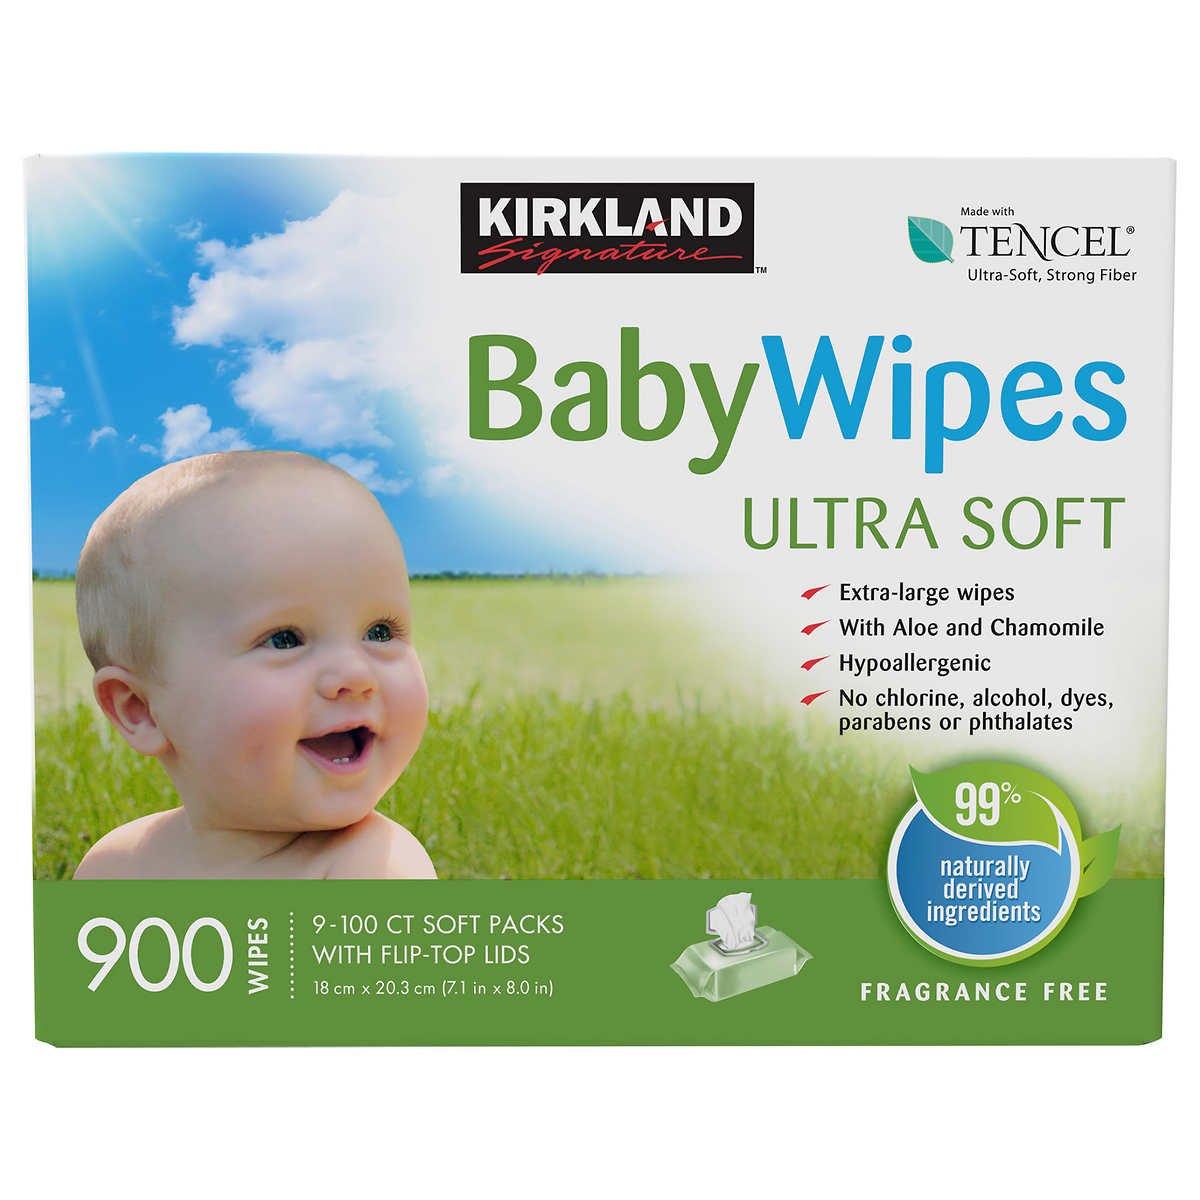 Kirkland Signature Baby Wipes (9000 Wipes)